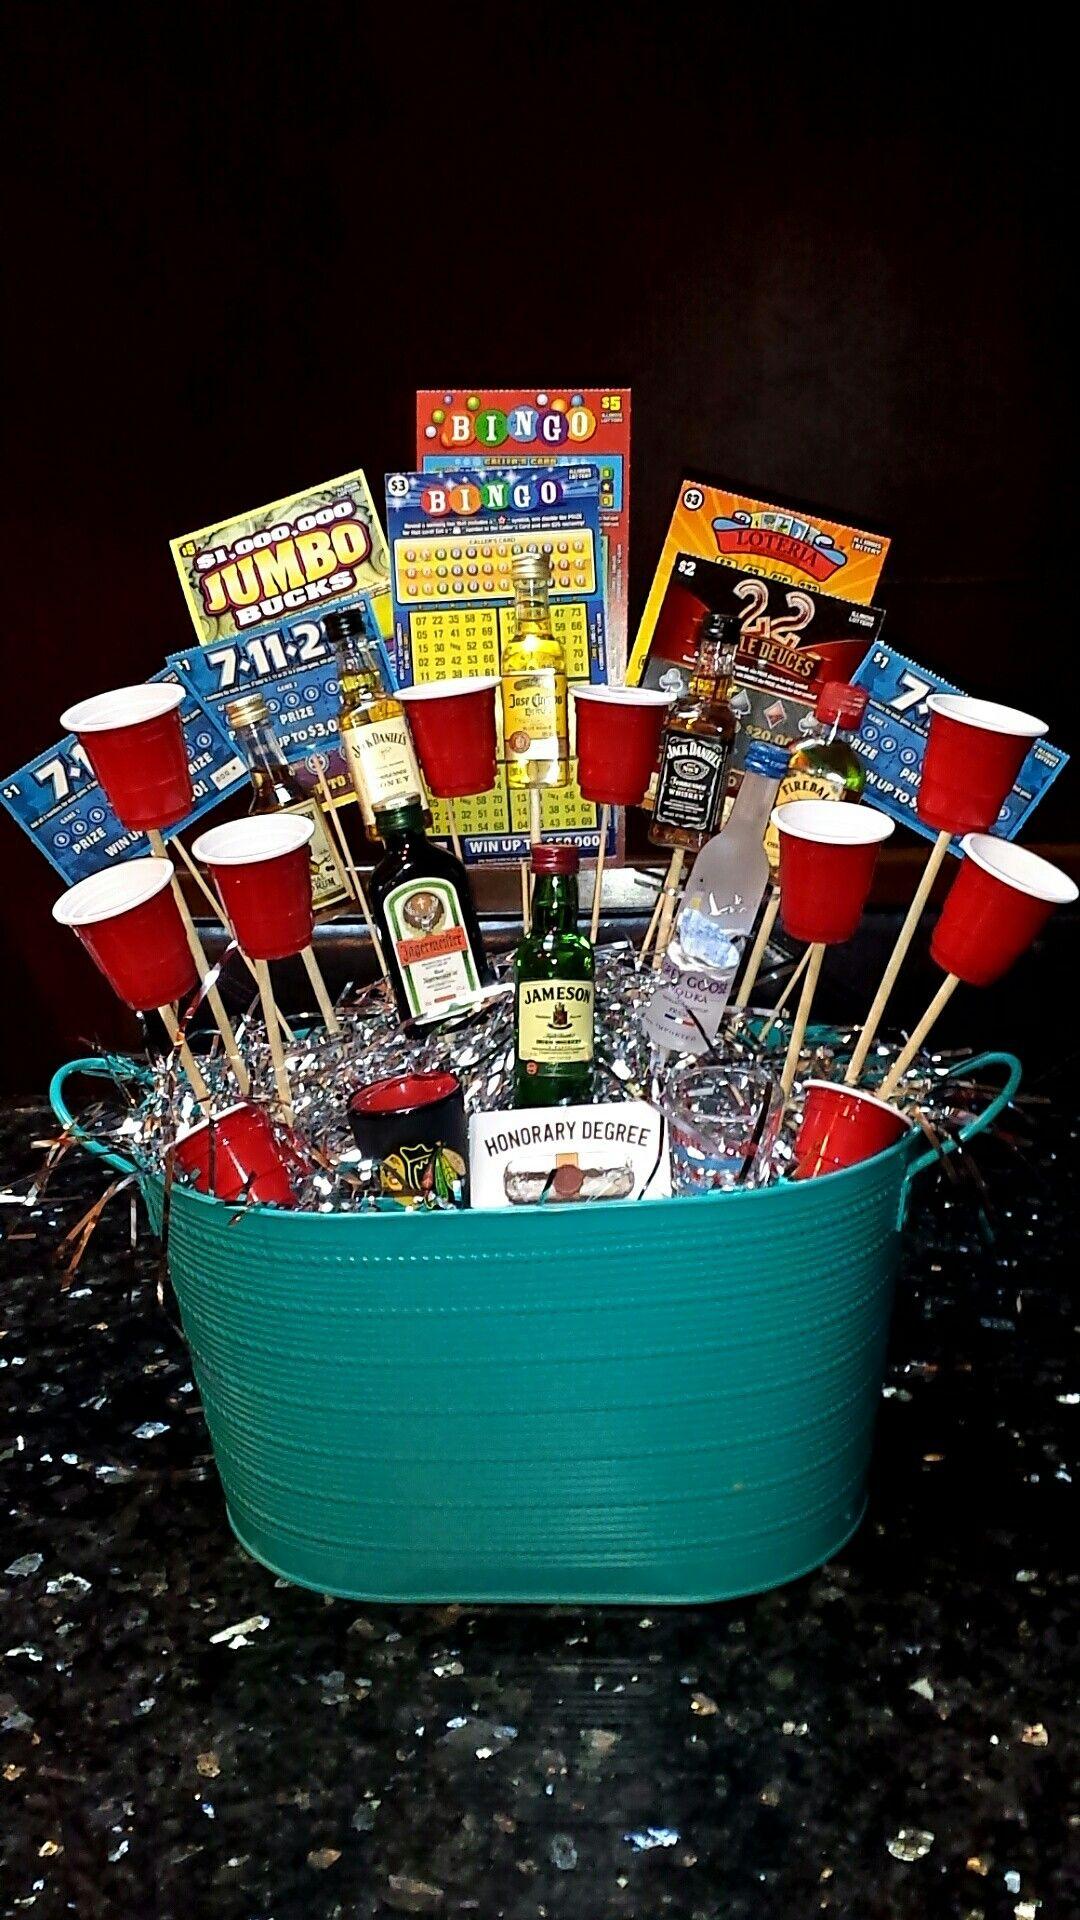 21st Birthday Gift Baskets For Him